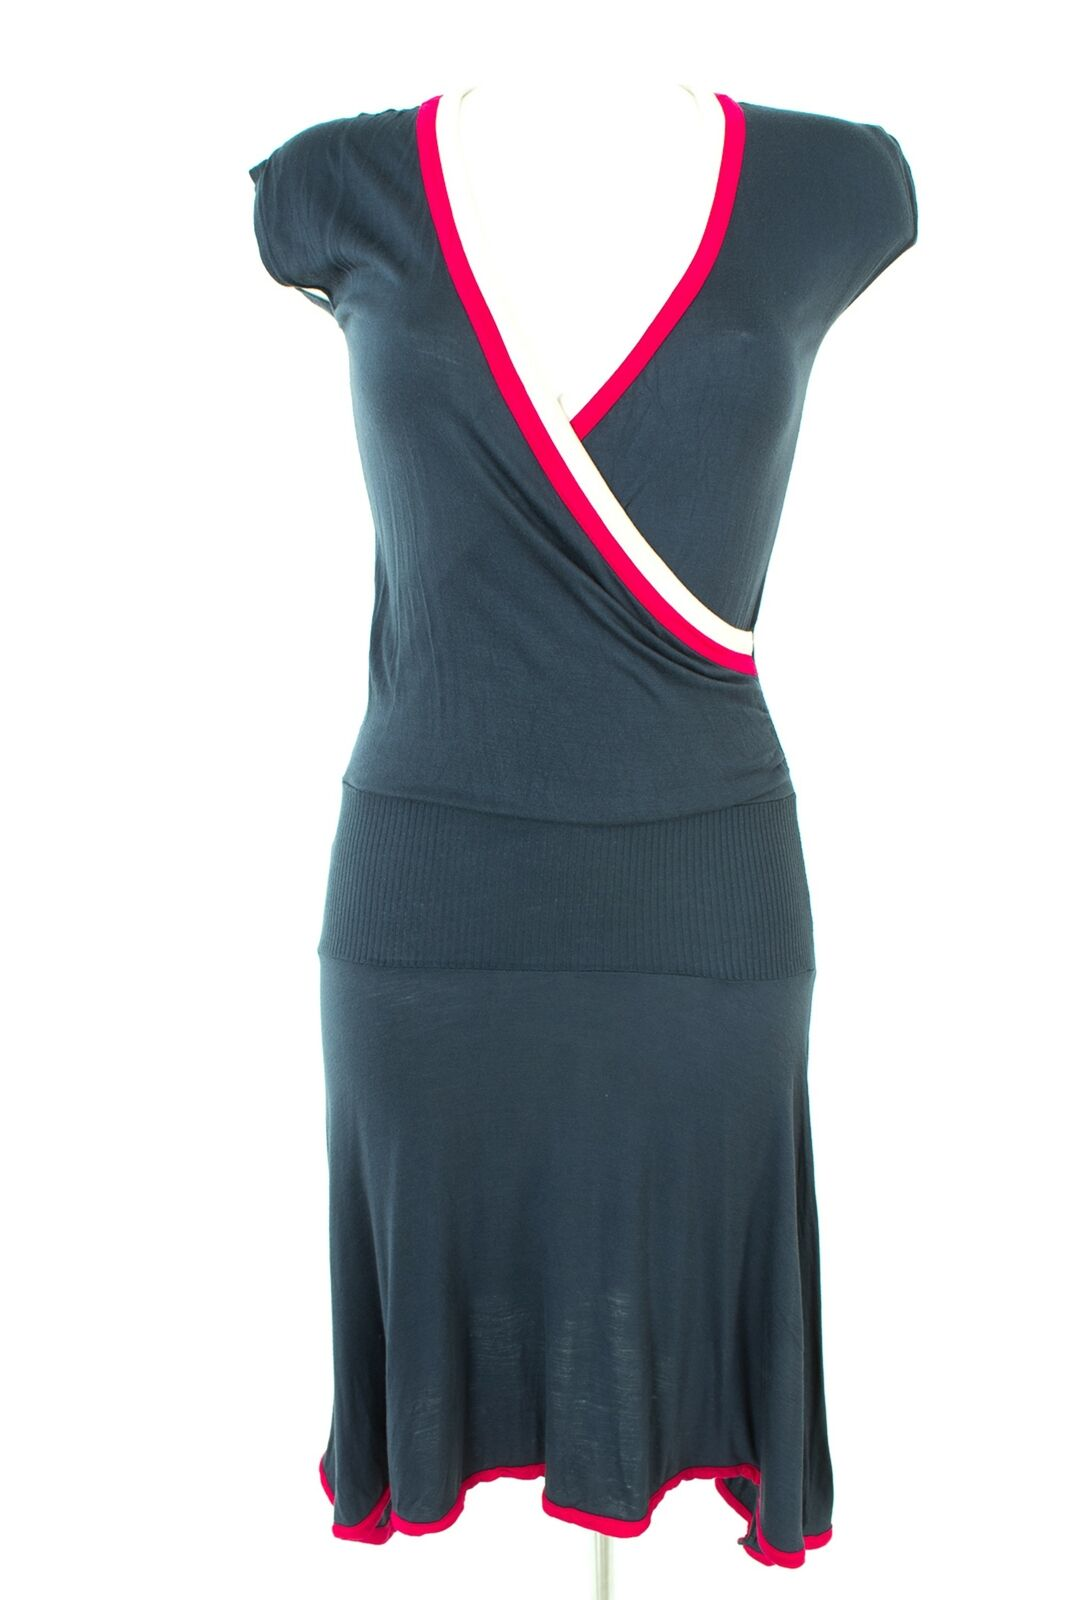 DEPT Damen Kleid Sommerkleid Viskose Gr. S